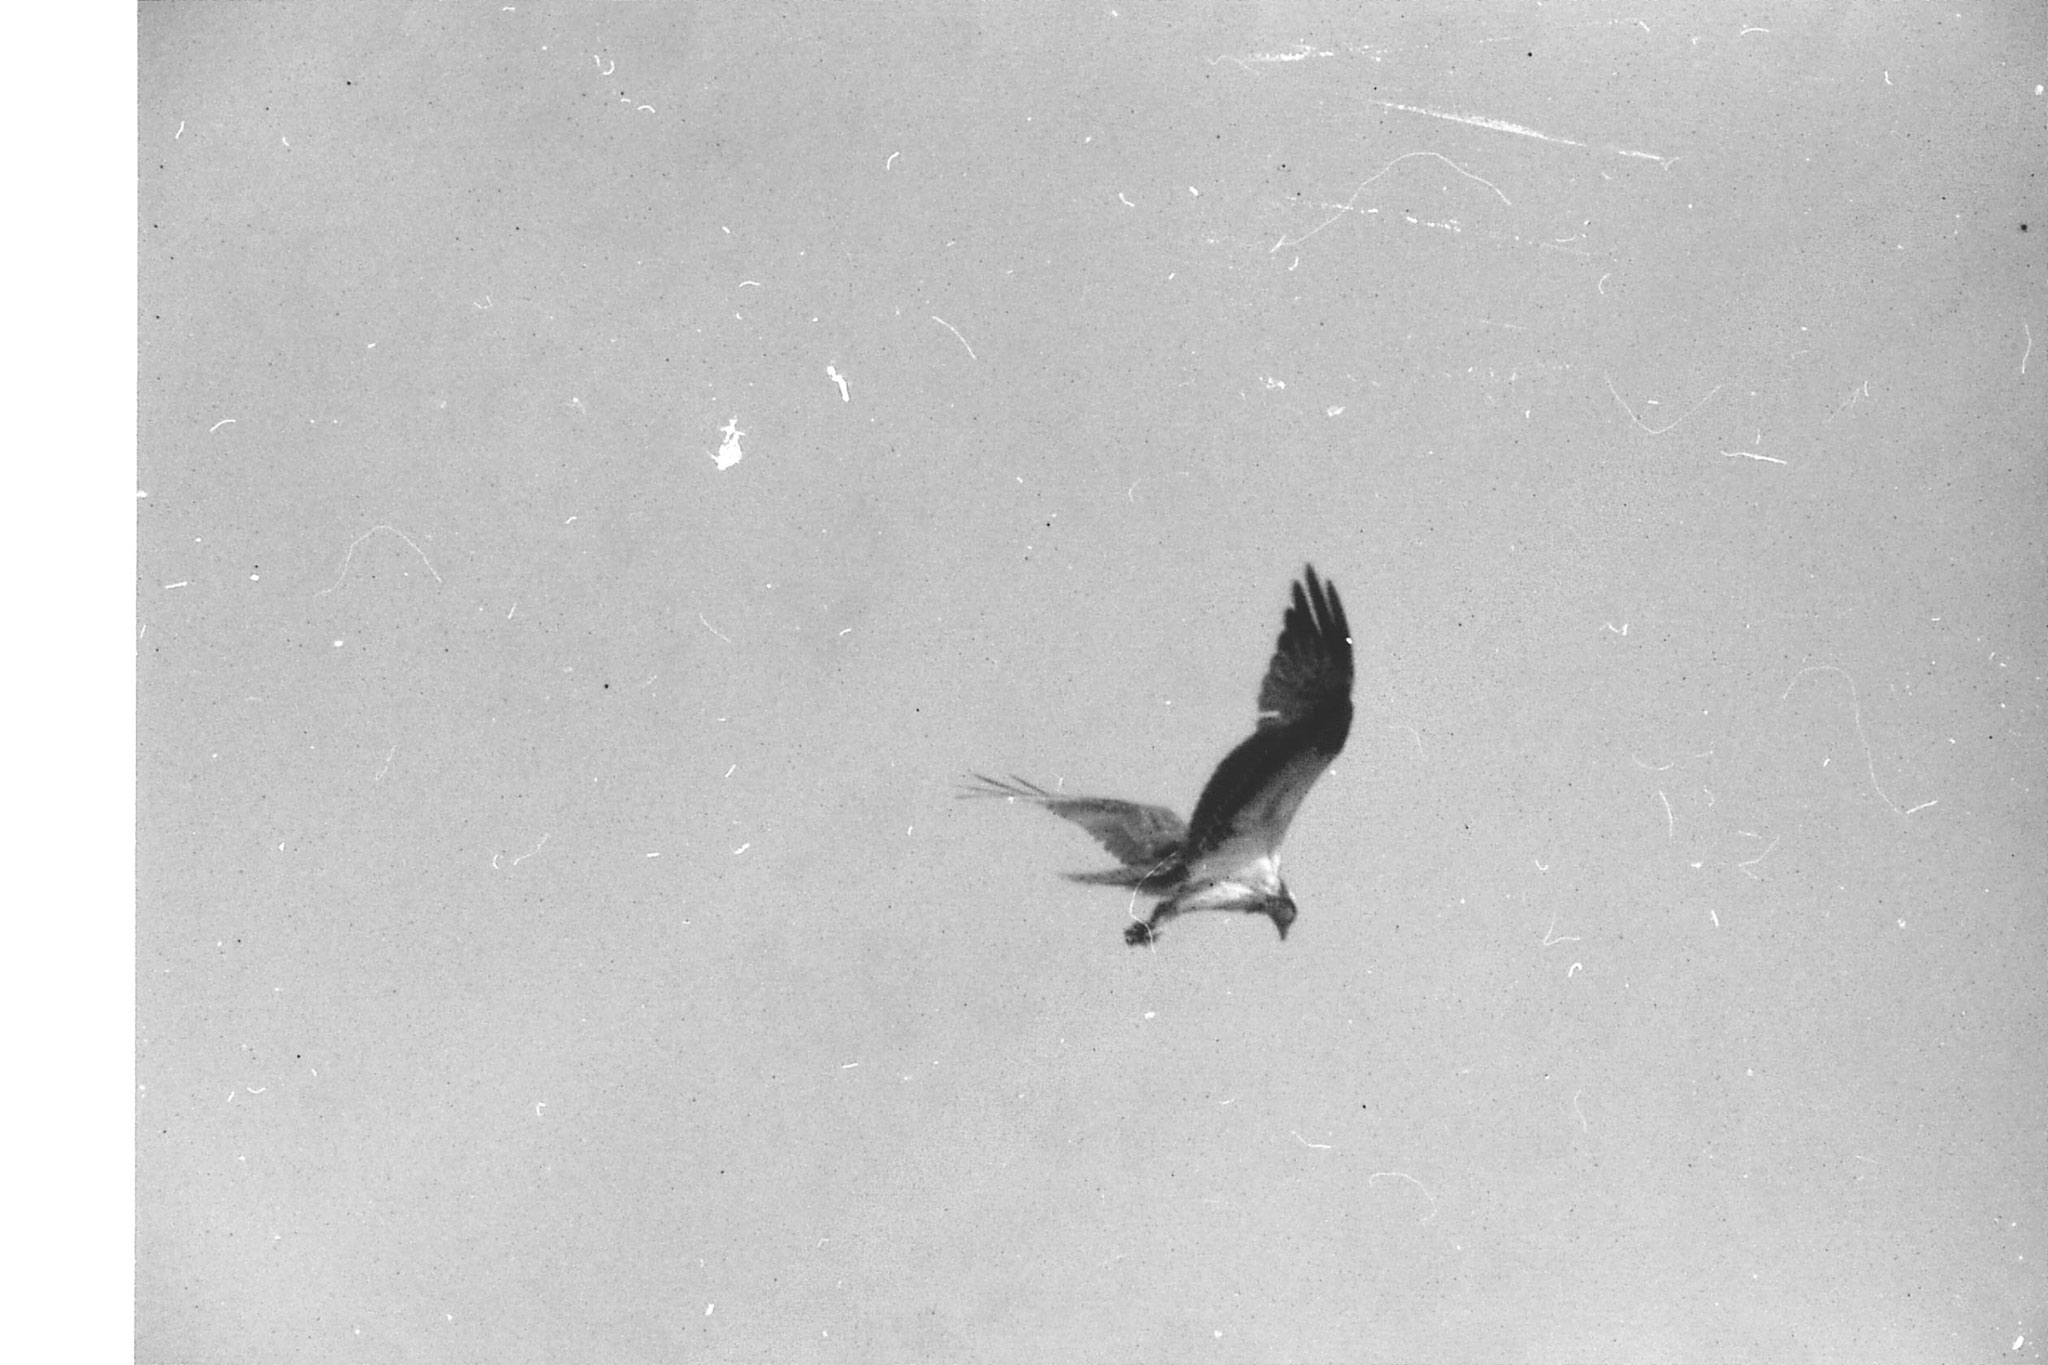 21/12/1990: 4: Everglades, osprey